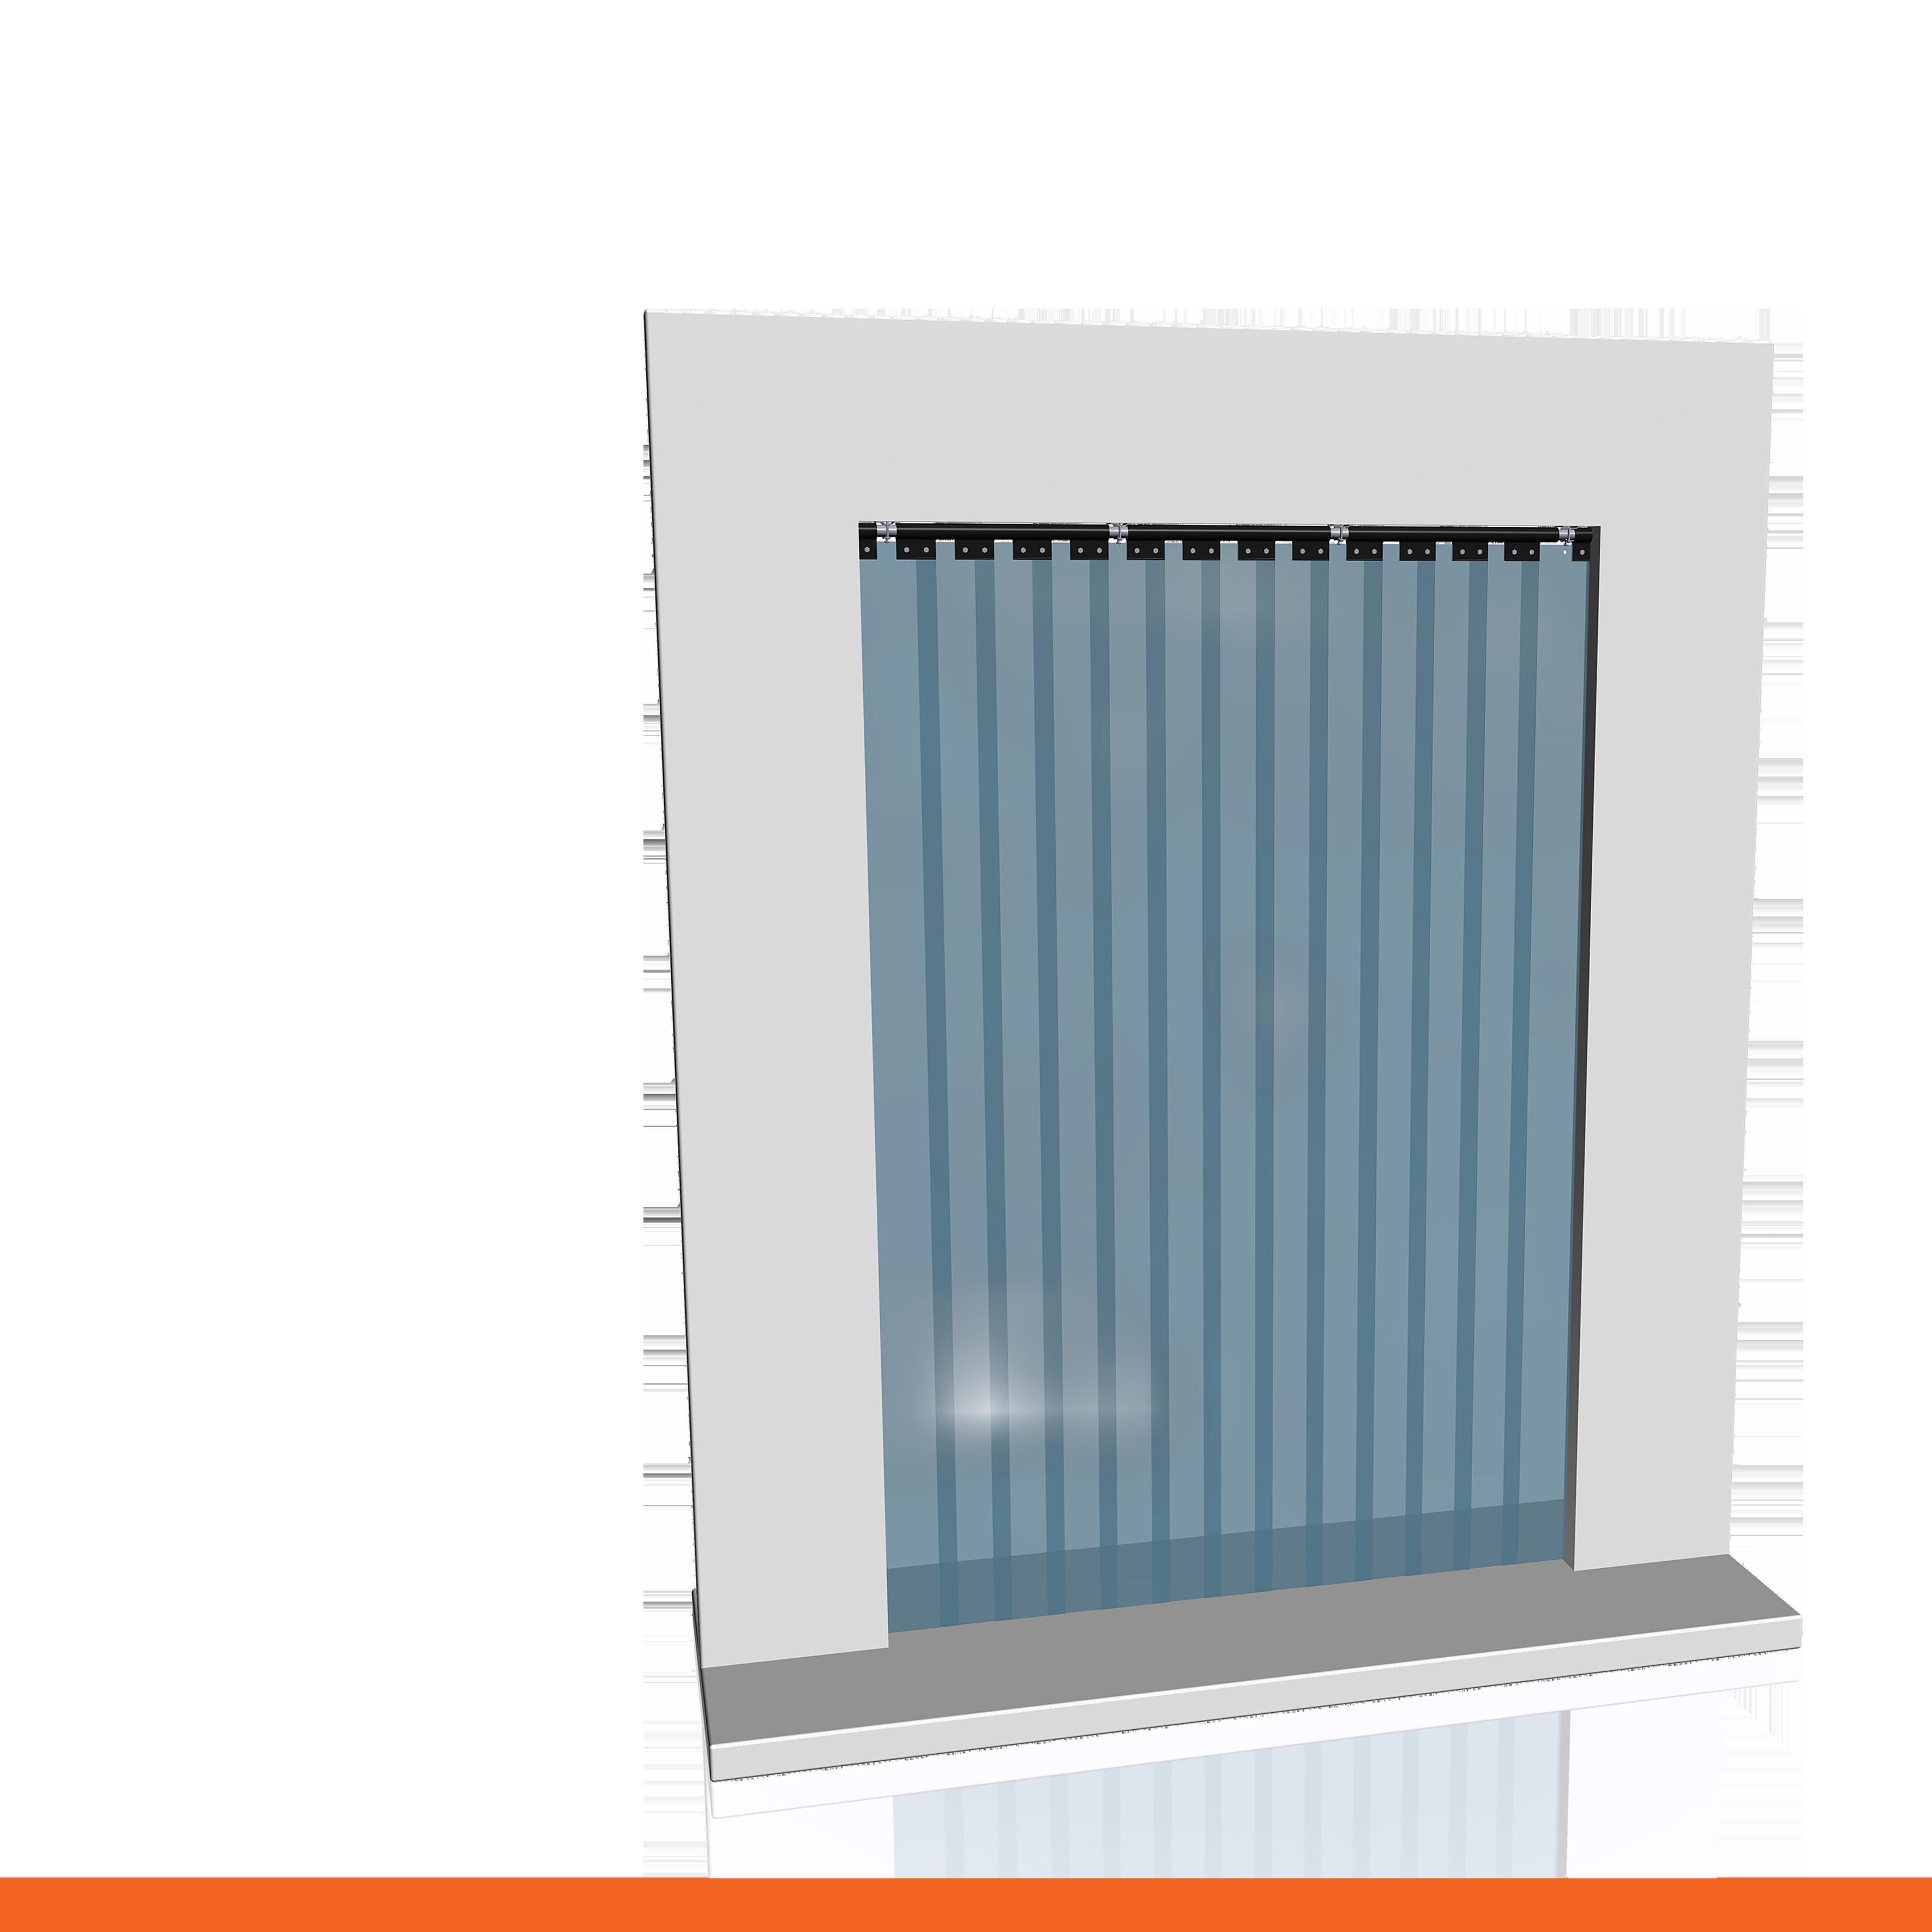 Porte per celle frigorifere fi ts 25 iv tende a for Tende a strisce in pvc